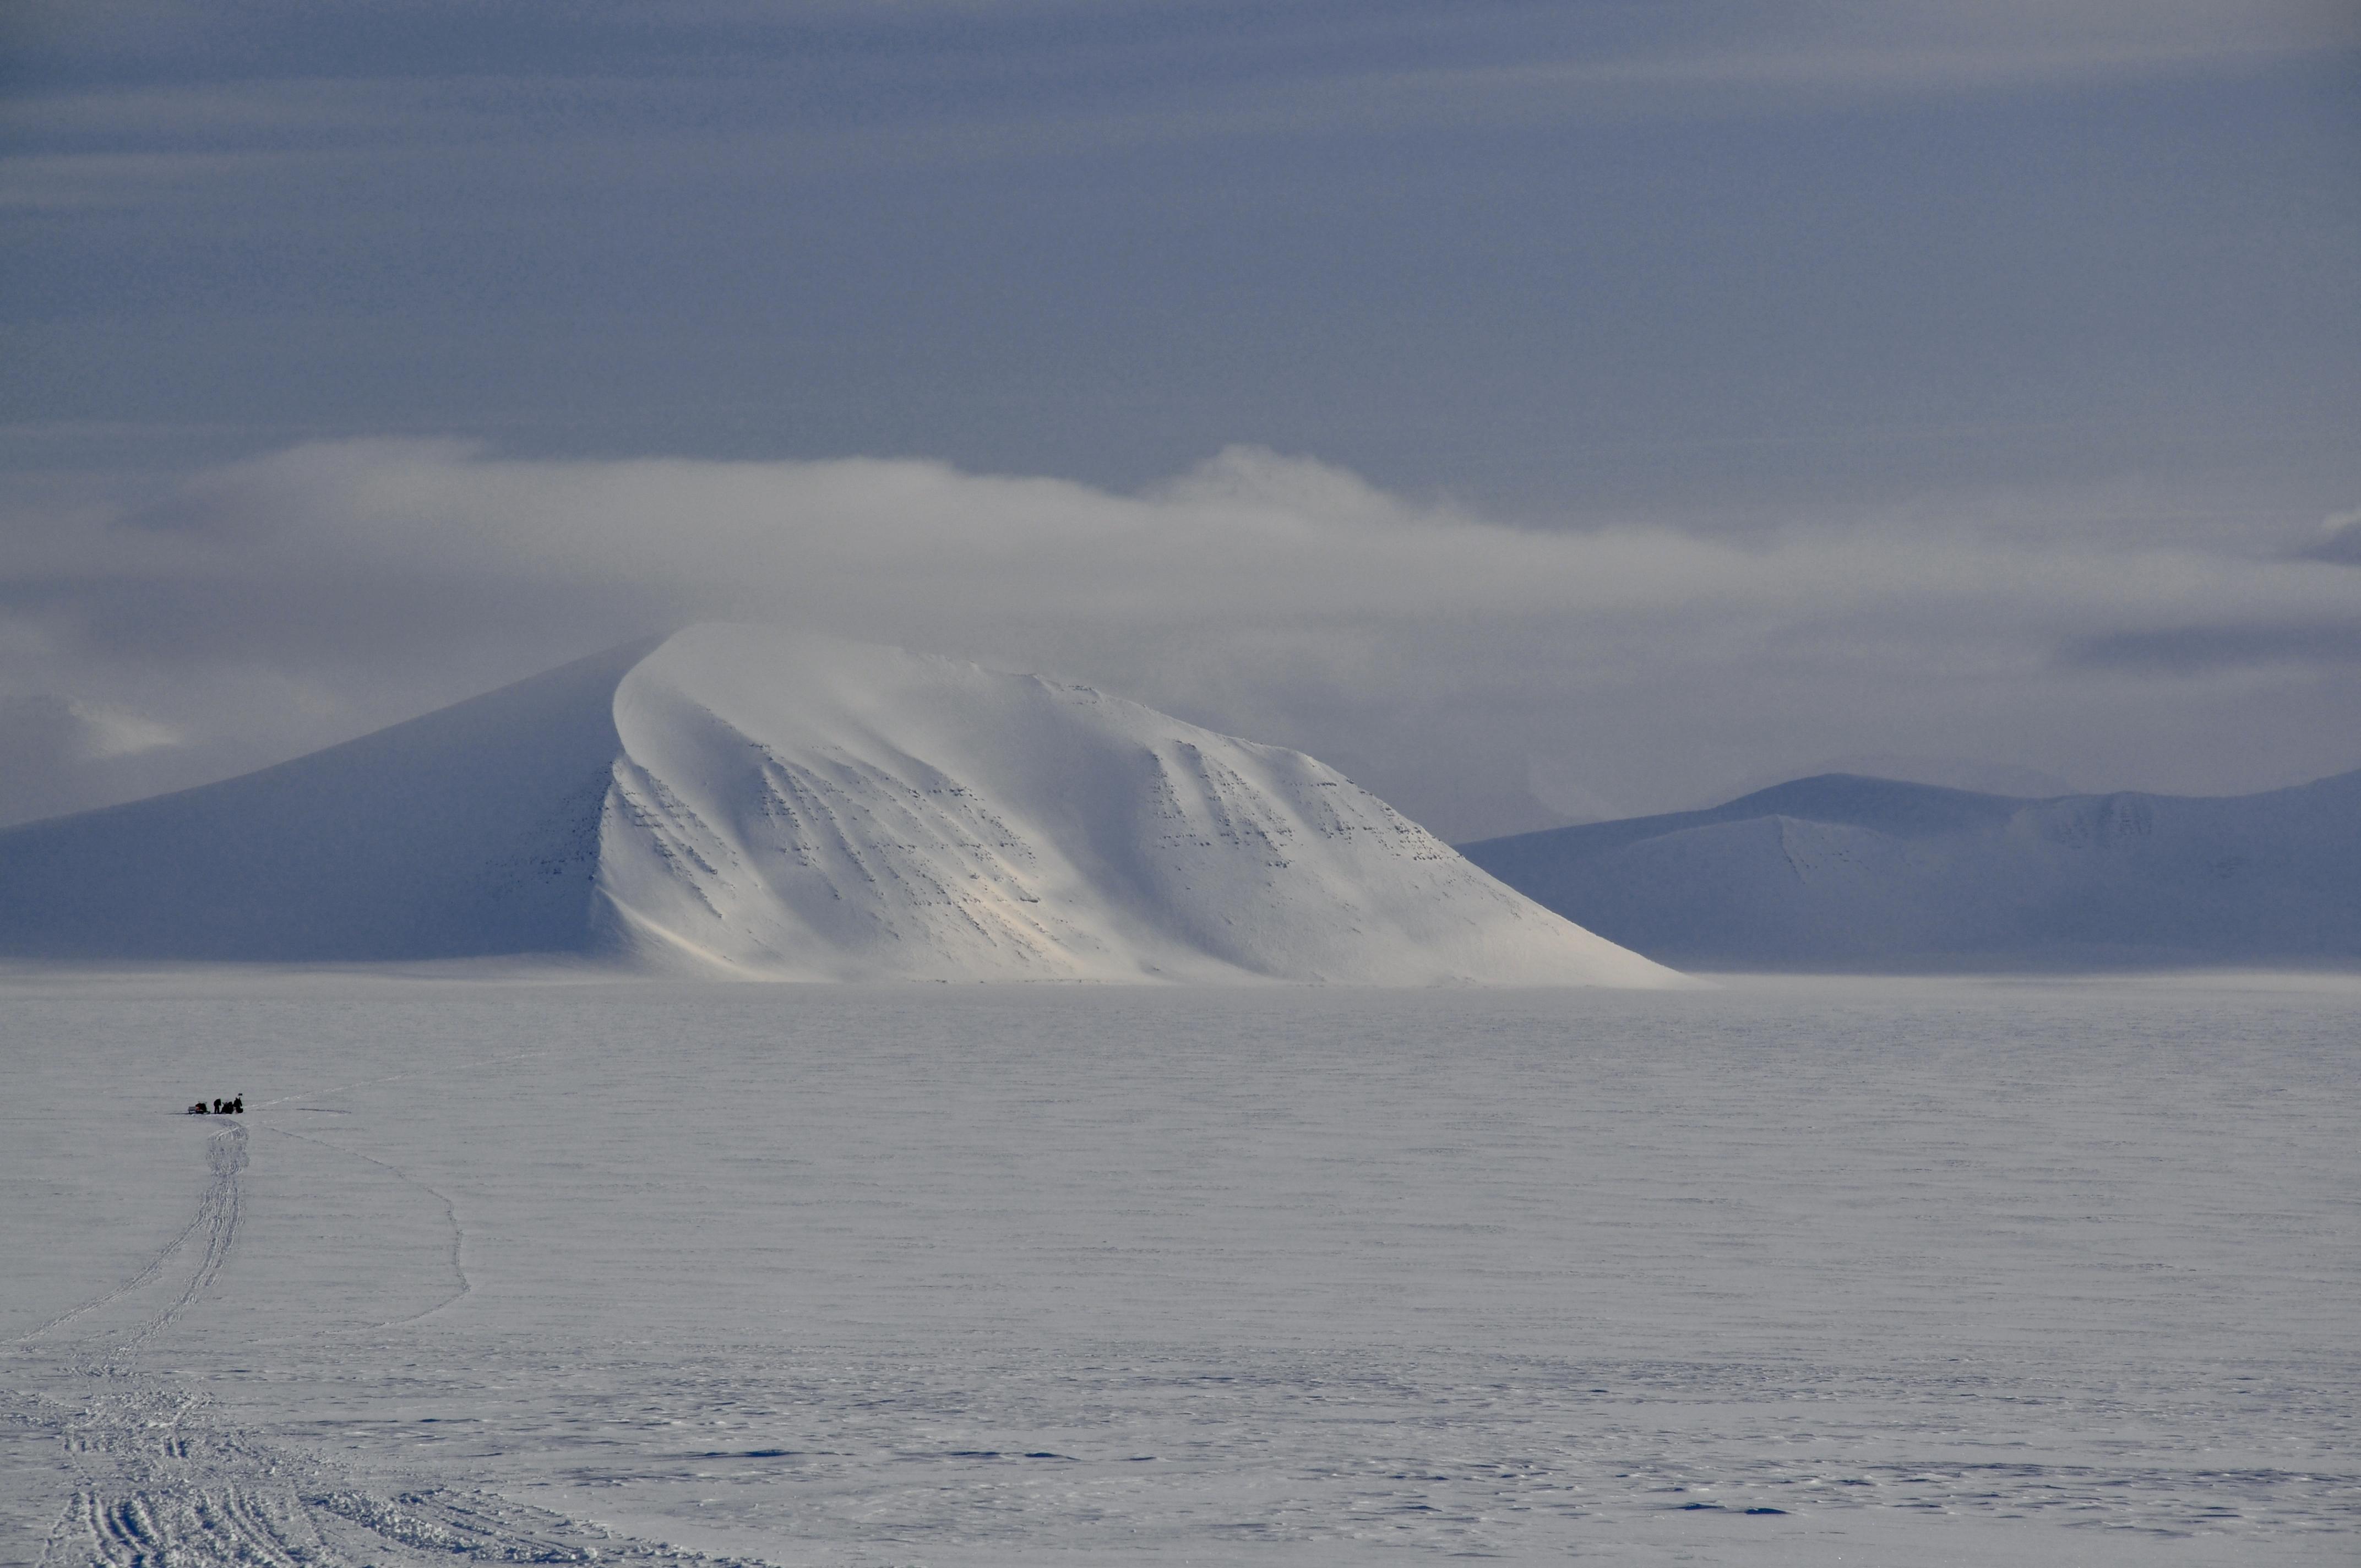 Spolaor_field_work_Svalbard.jpg